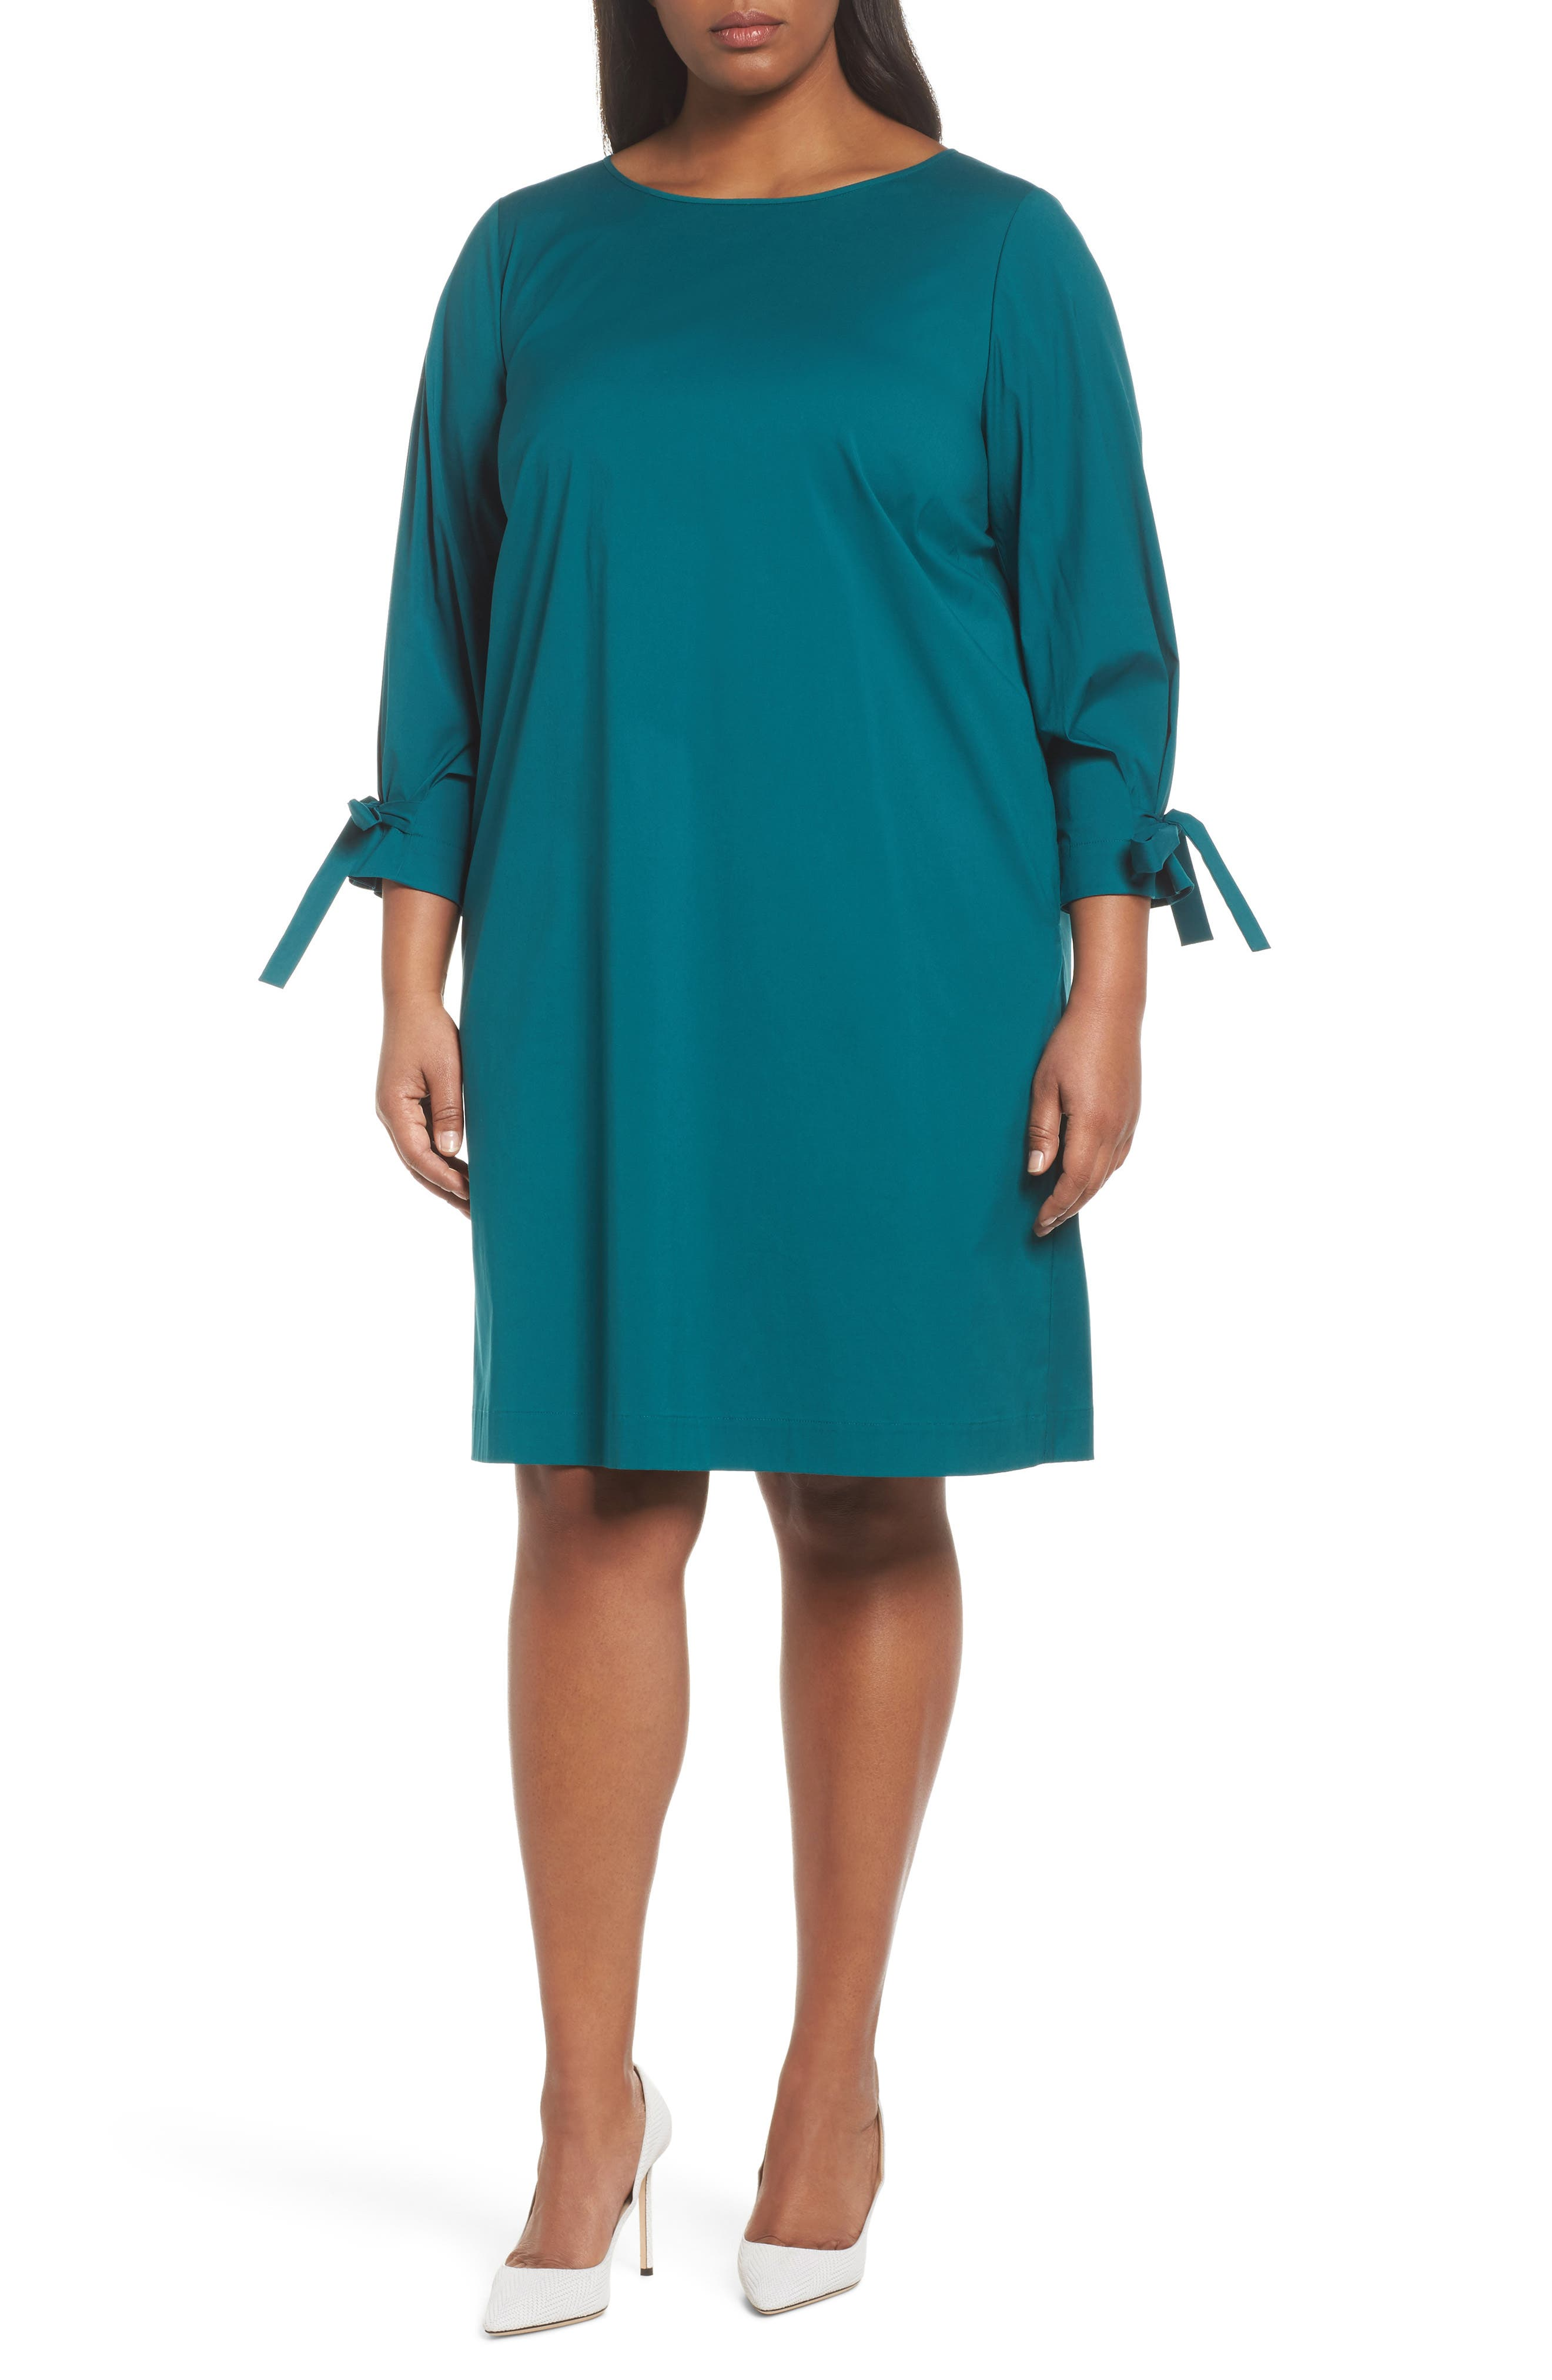 Alternate Image 1 Selected - Lafayette 148 New York Paige Shift Dress (Plus Size)